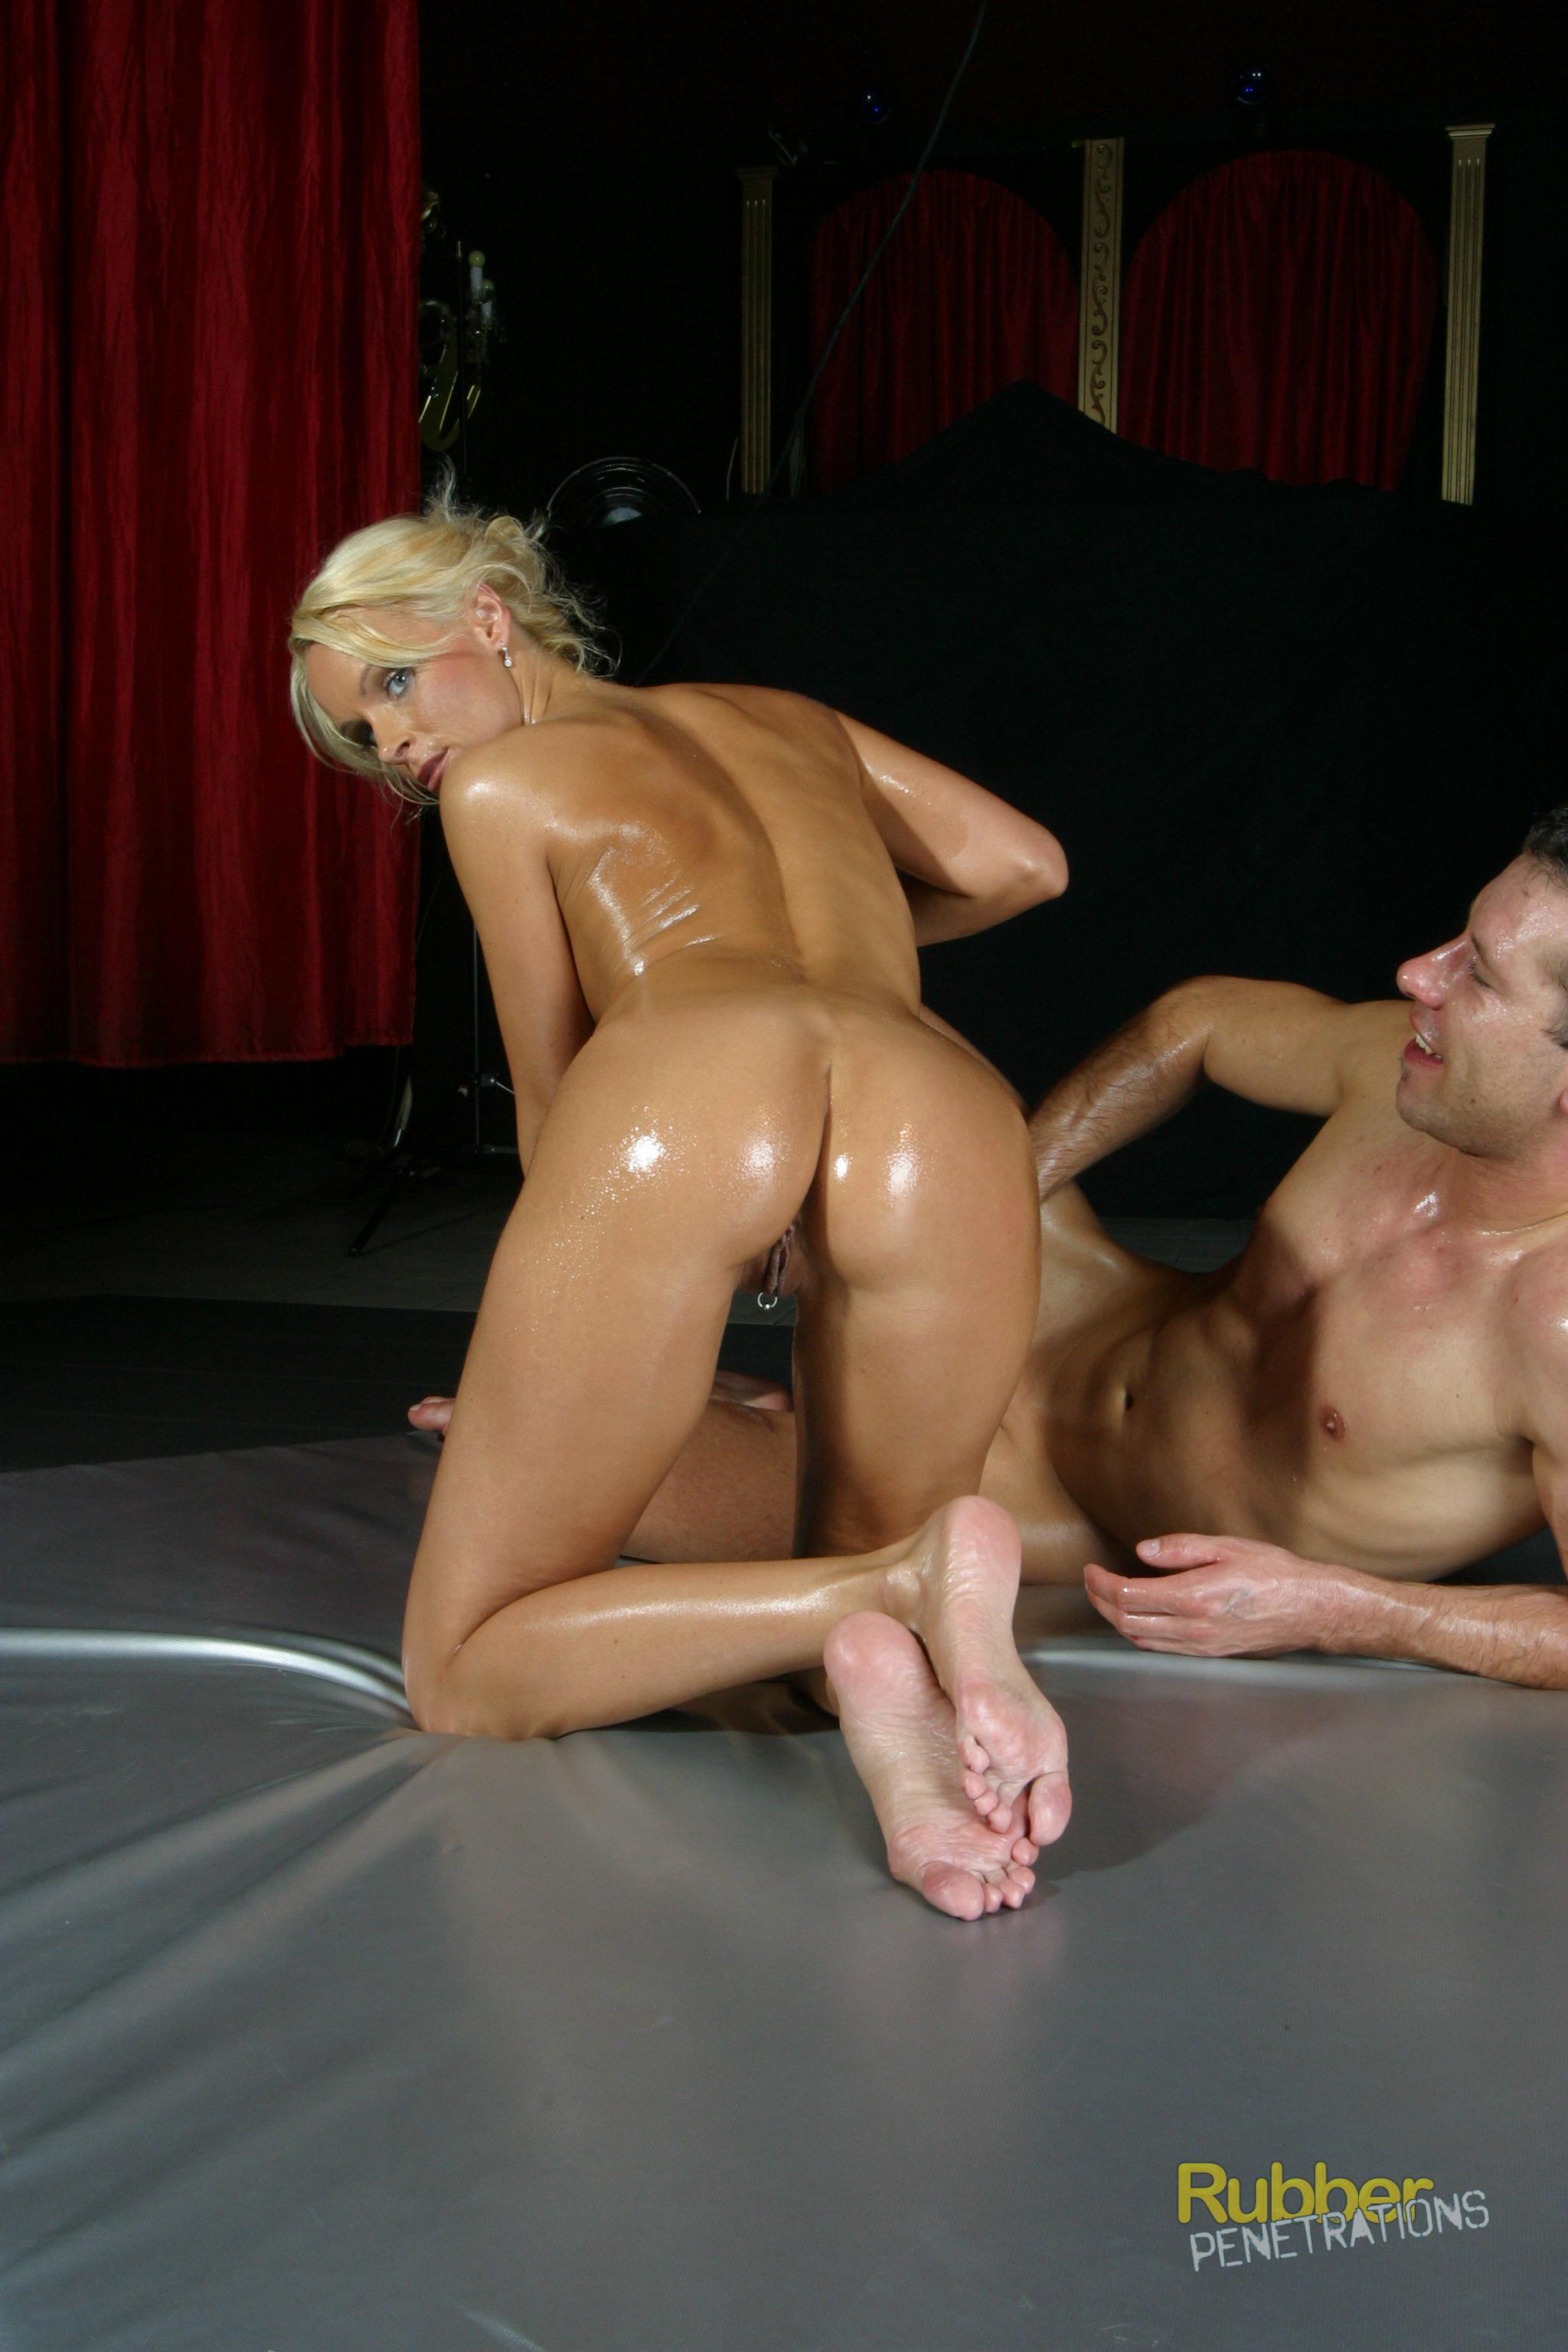 nova sex and naked photo